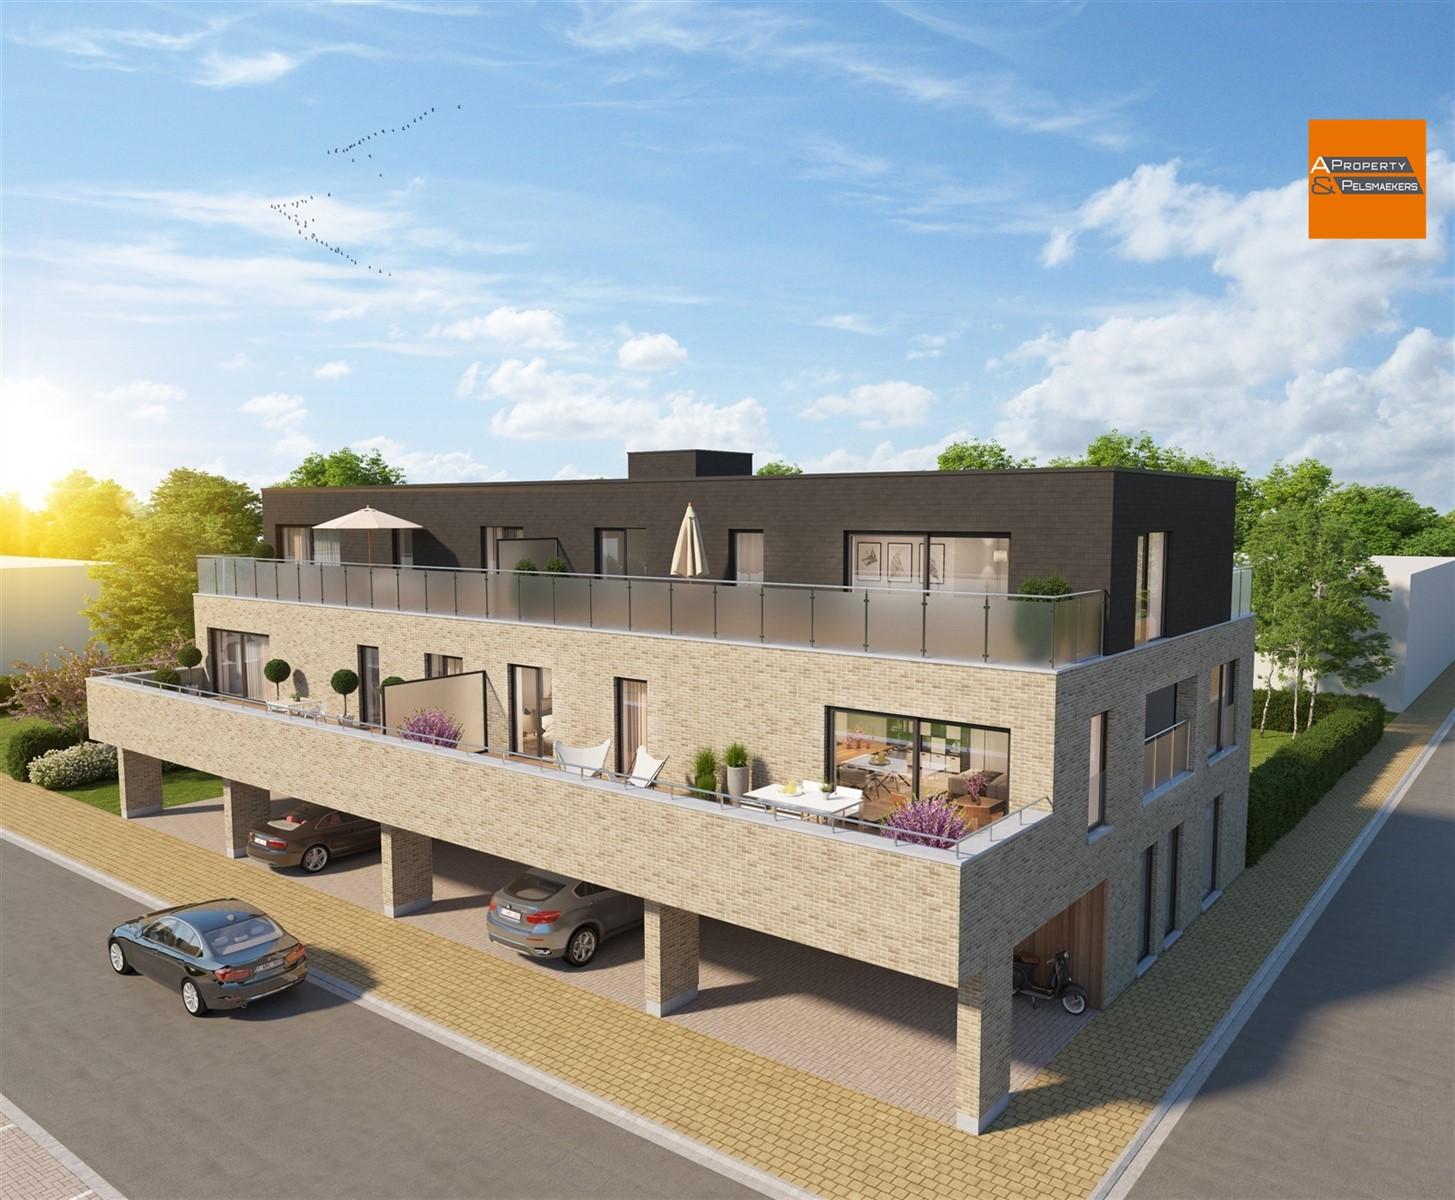 Real estate project : Residentie ROBUSTA IN WEZEMAAL (3111) - Price